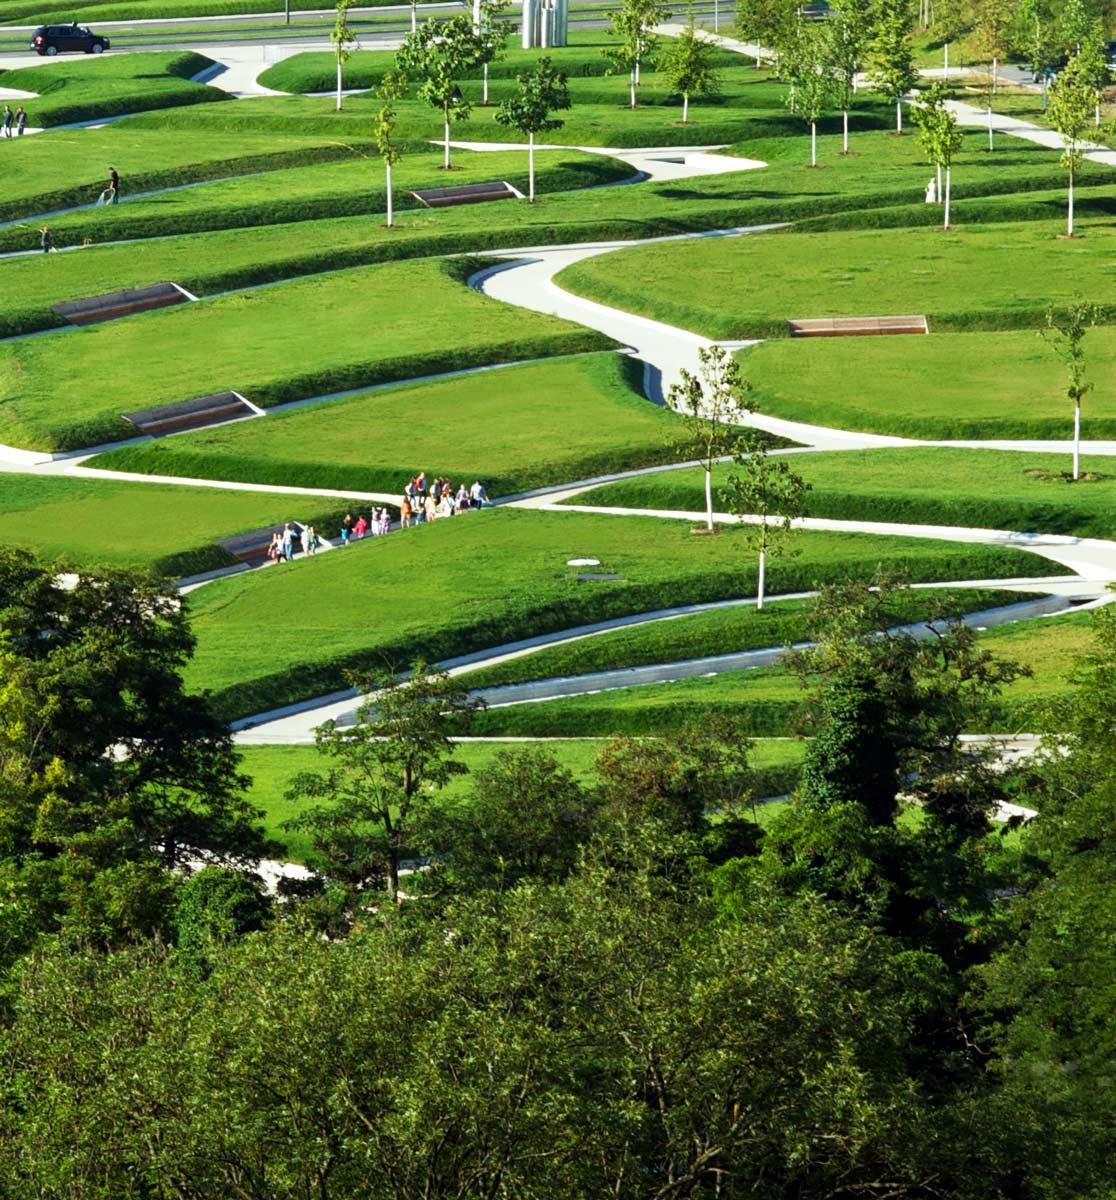 Landscape Architects: Development Towards An Urban Environment